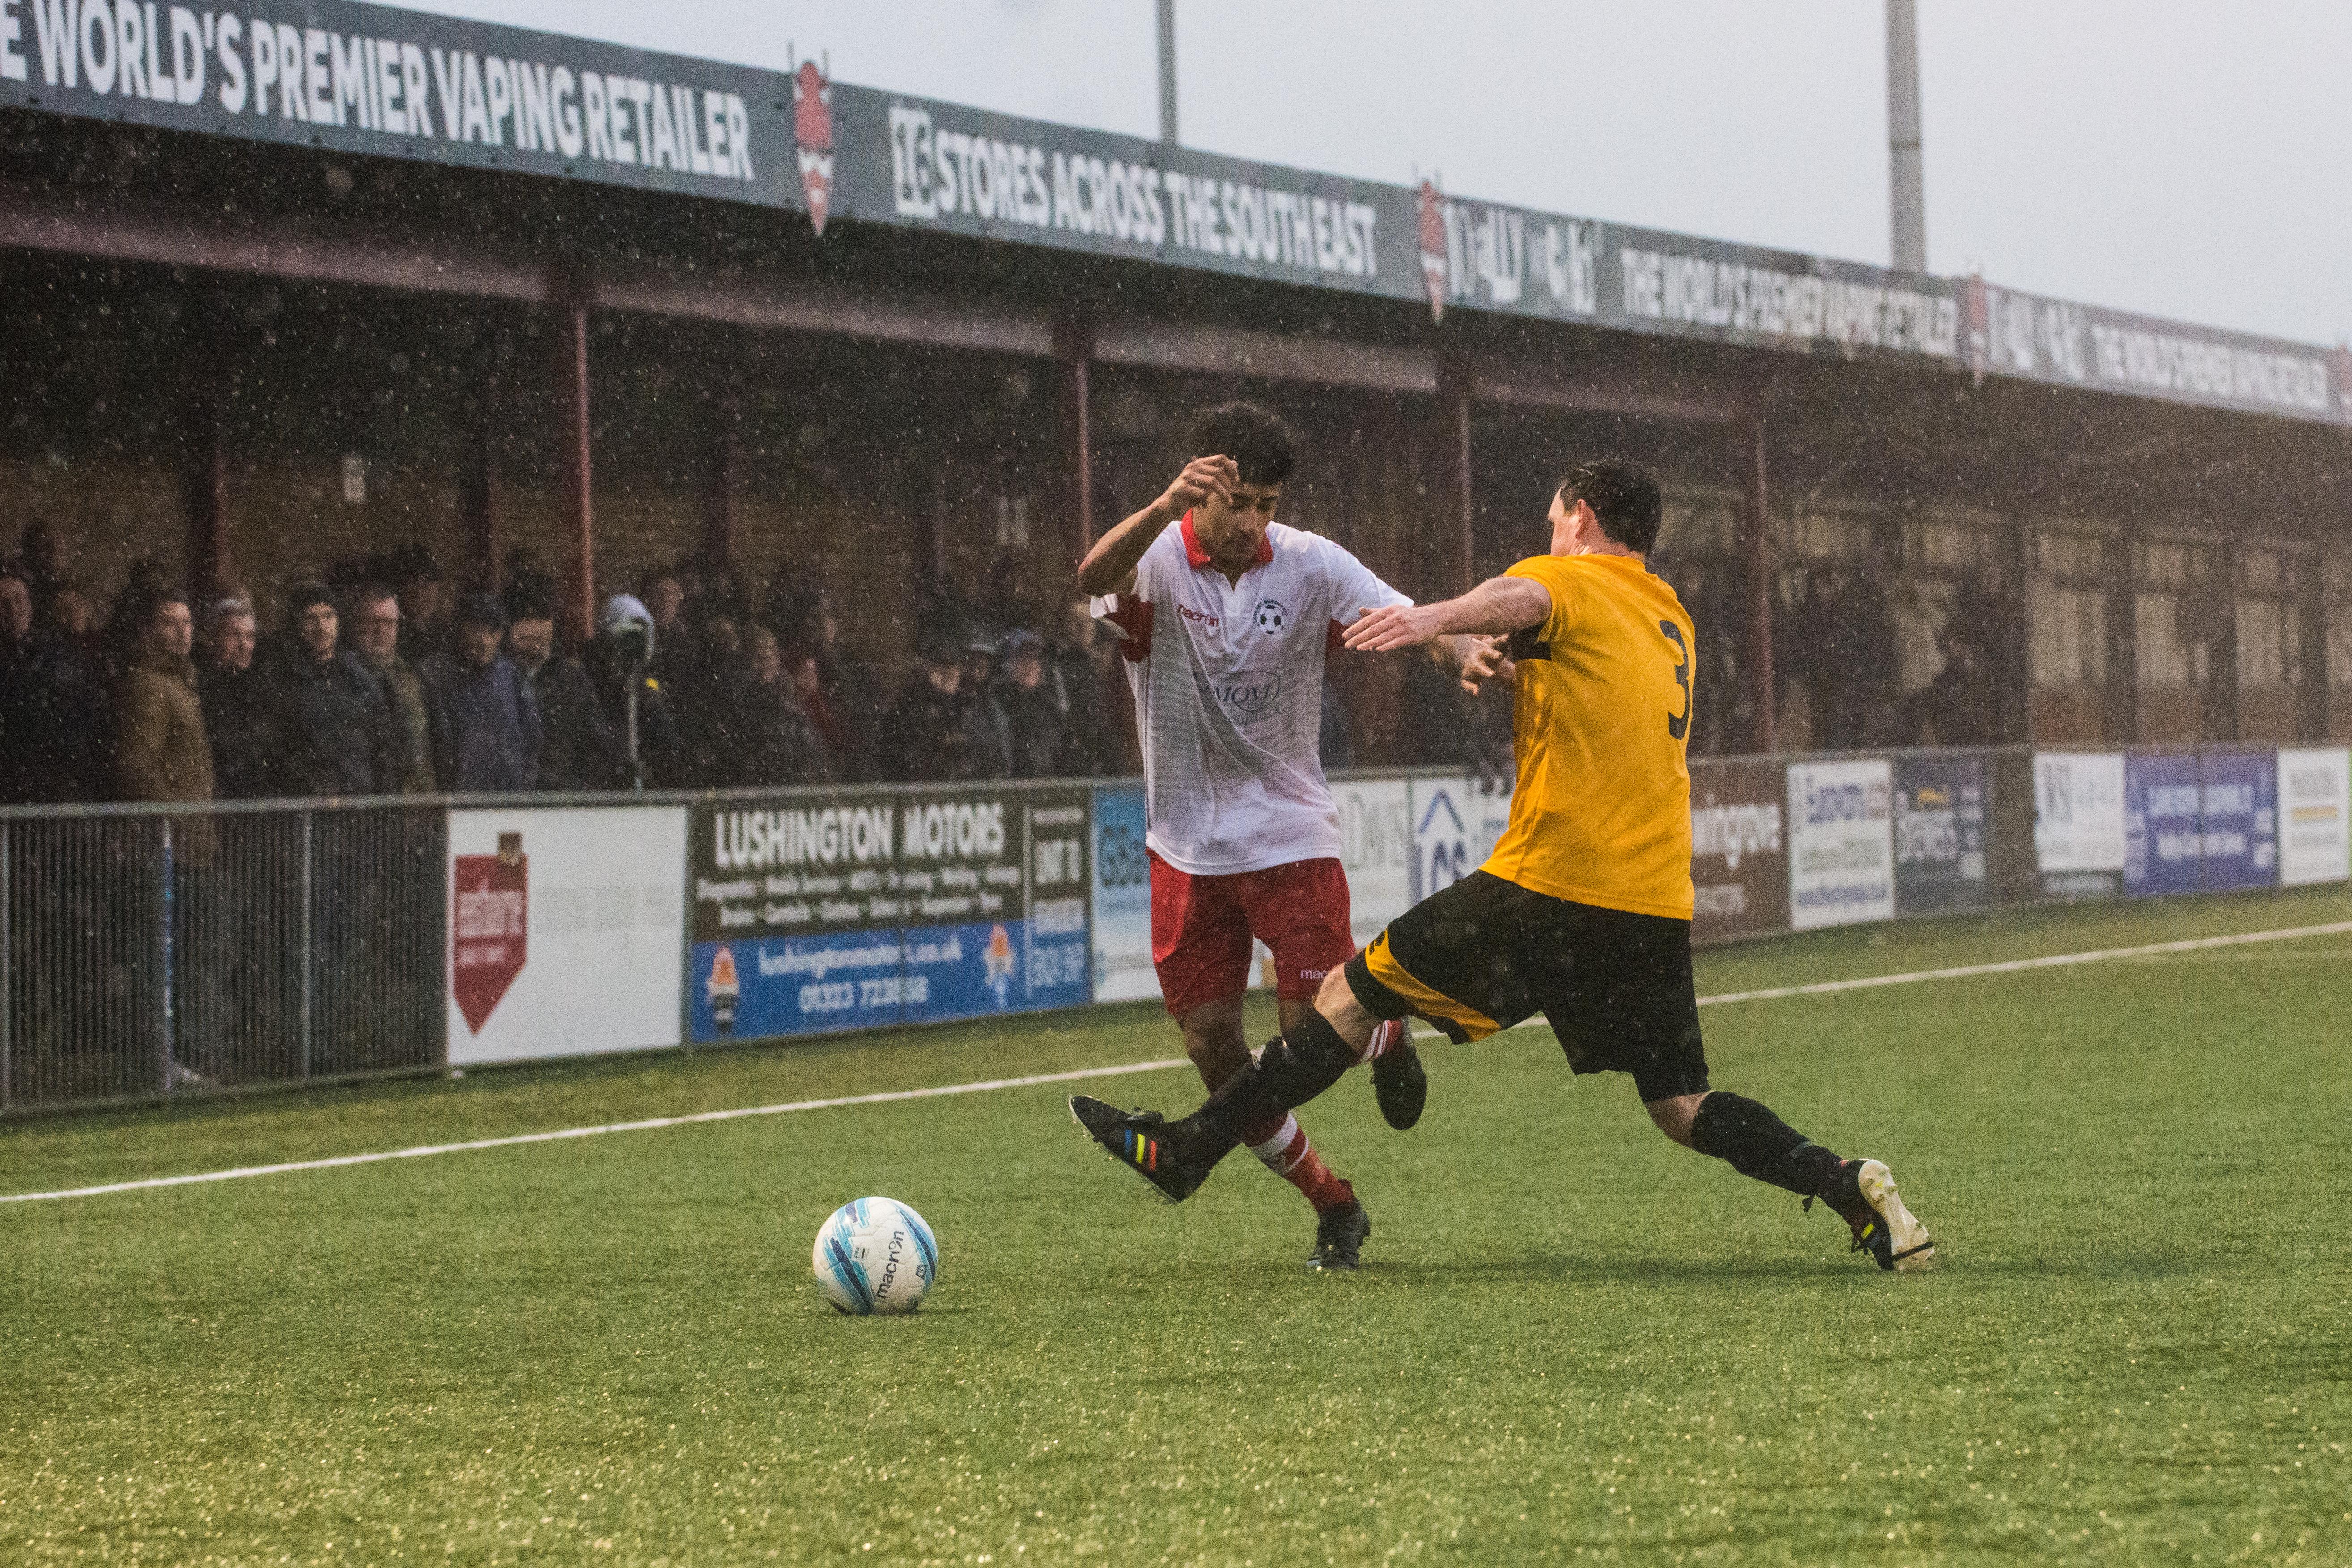 DAVID_JEFFERY Langney Wanderers FC vs Bexhill United FC 03.03.18 99